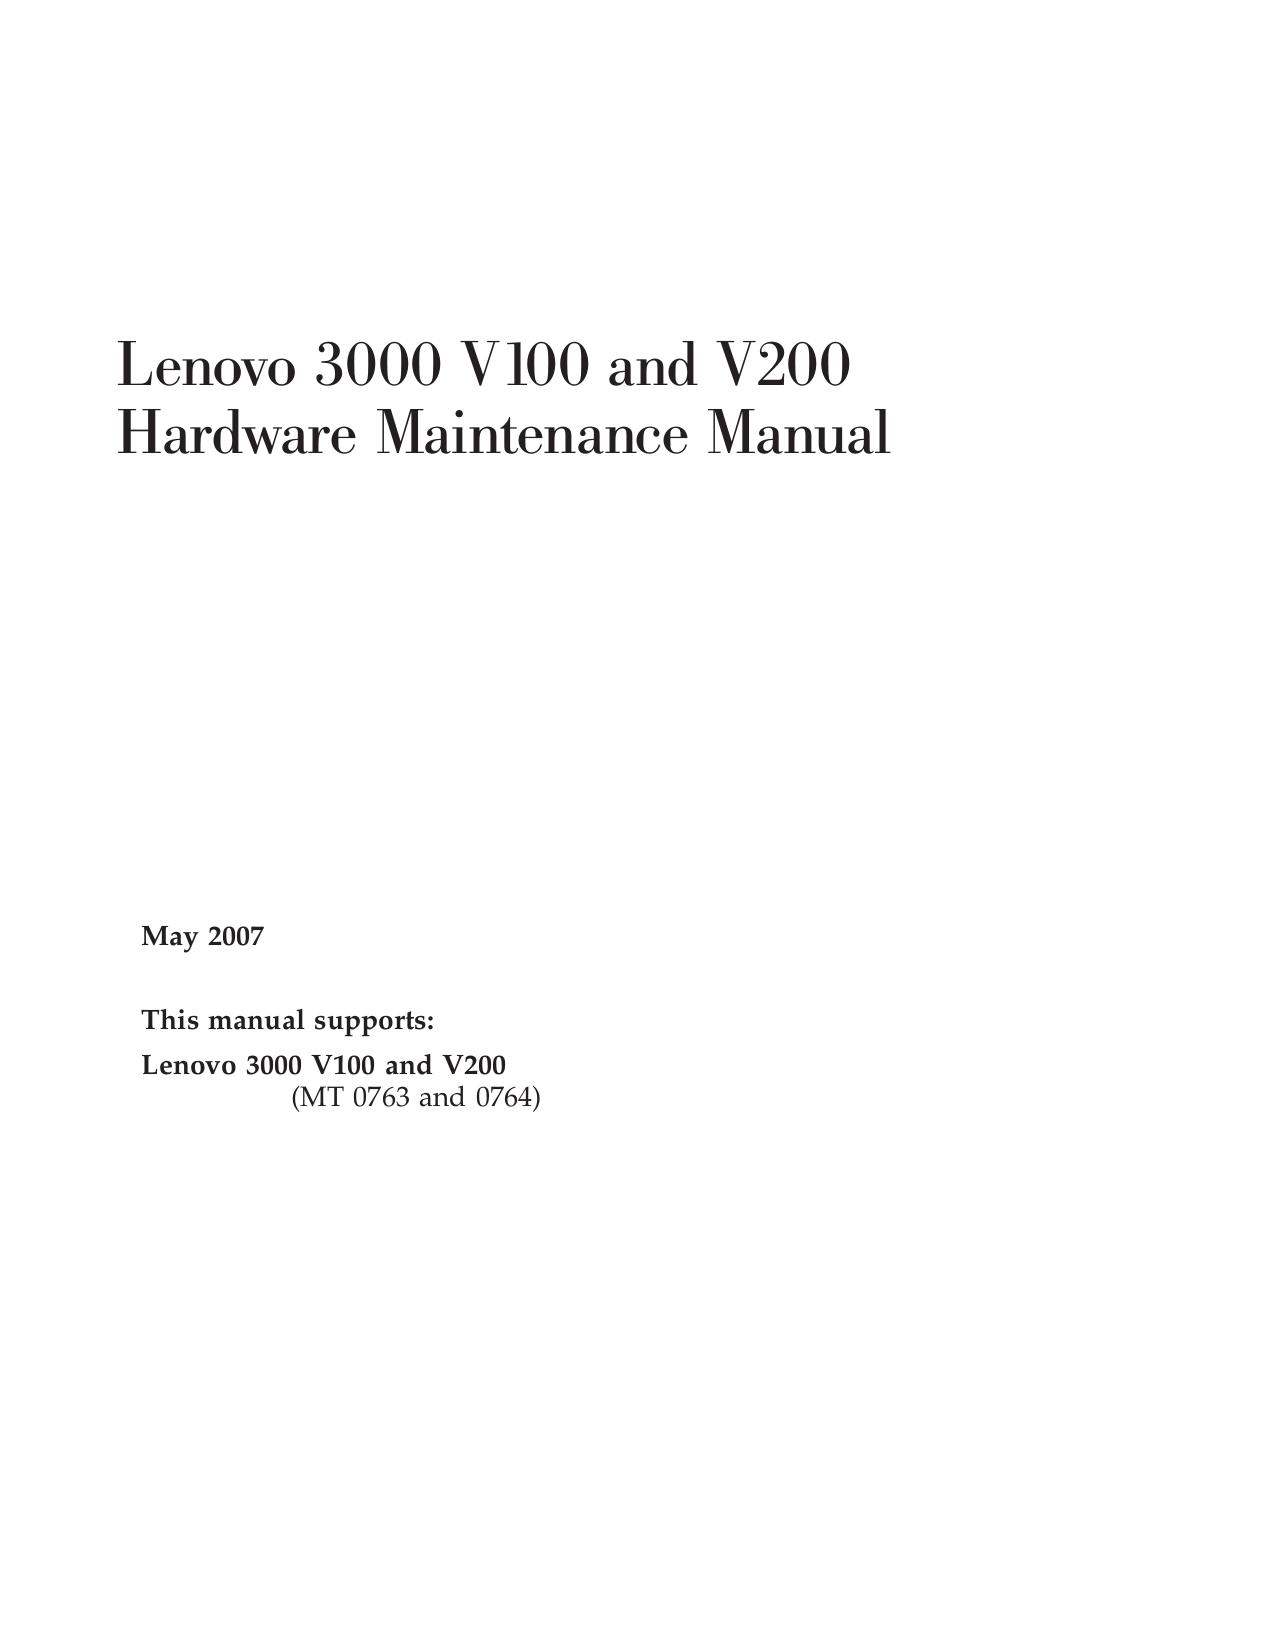 download free pdf for lenovo 3000 v100 0763 laptop manual rh umlib com Lenovo 3000 Desktop Lenovo 3000 Desktop